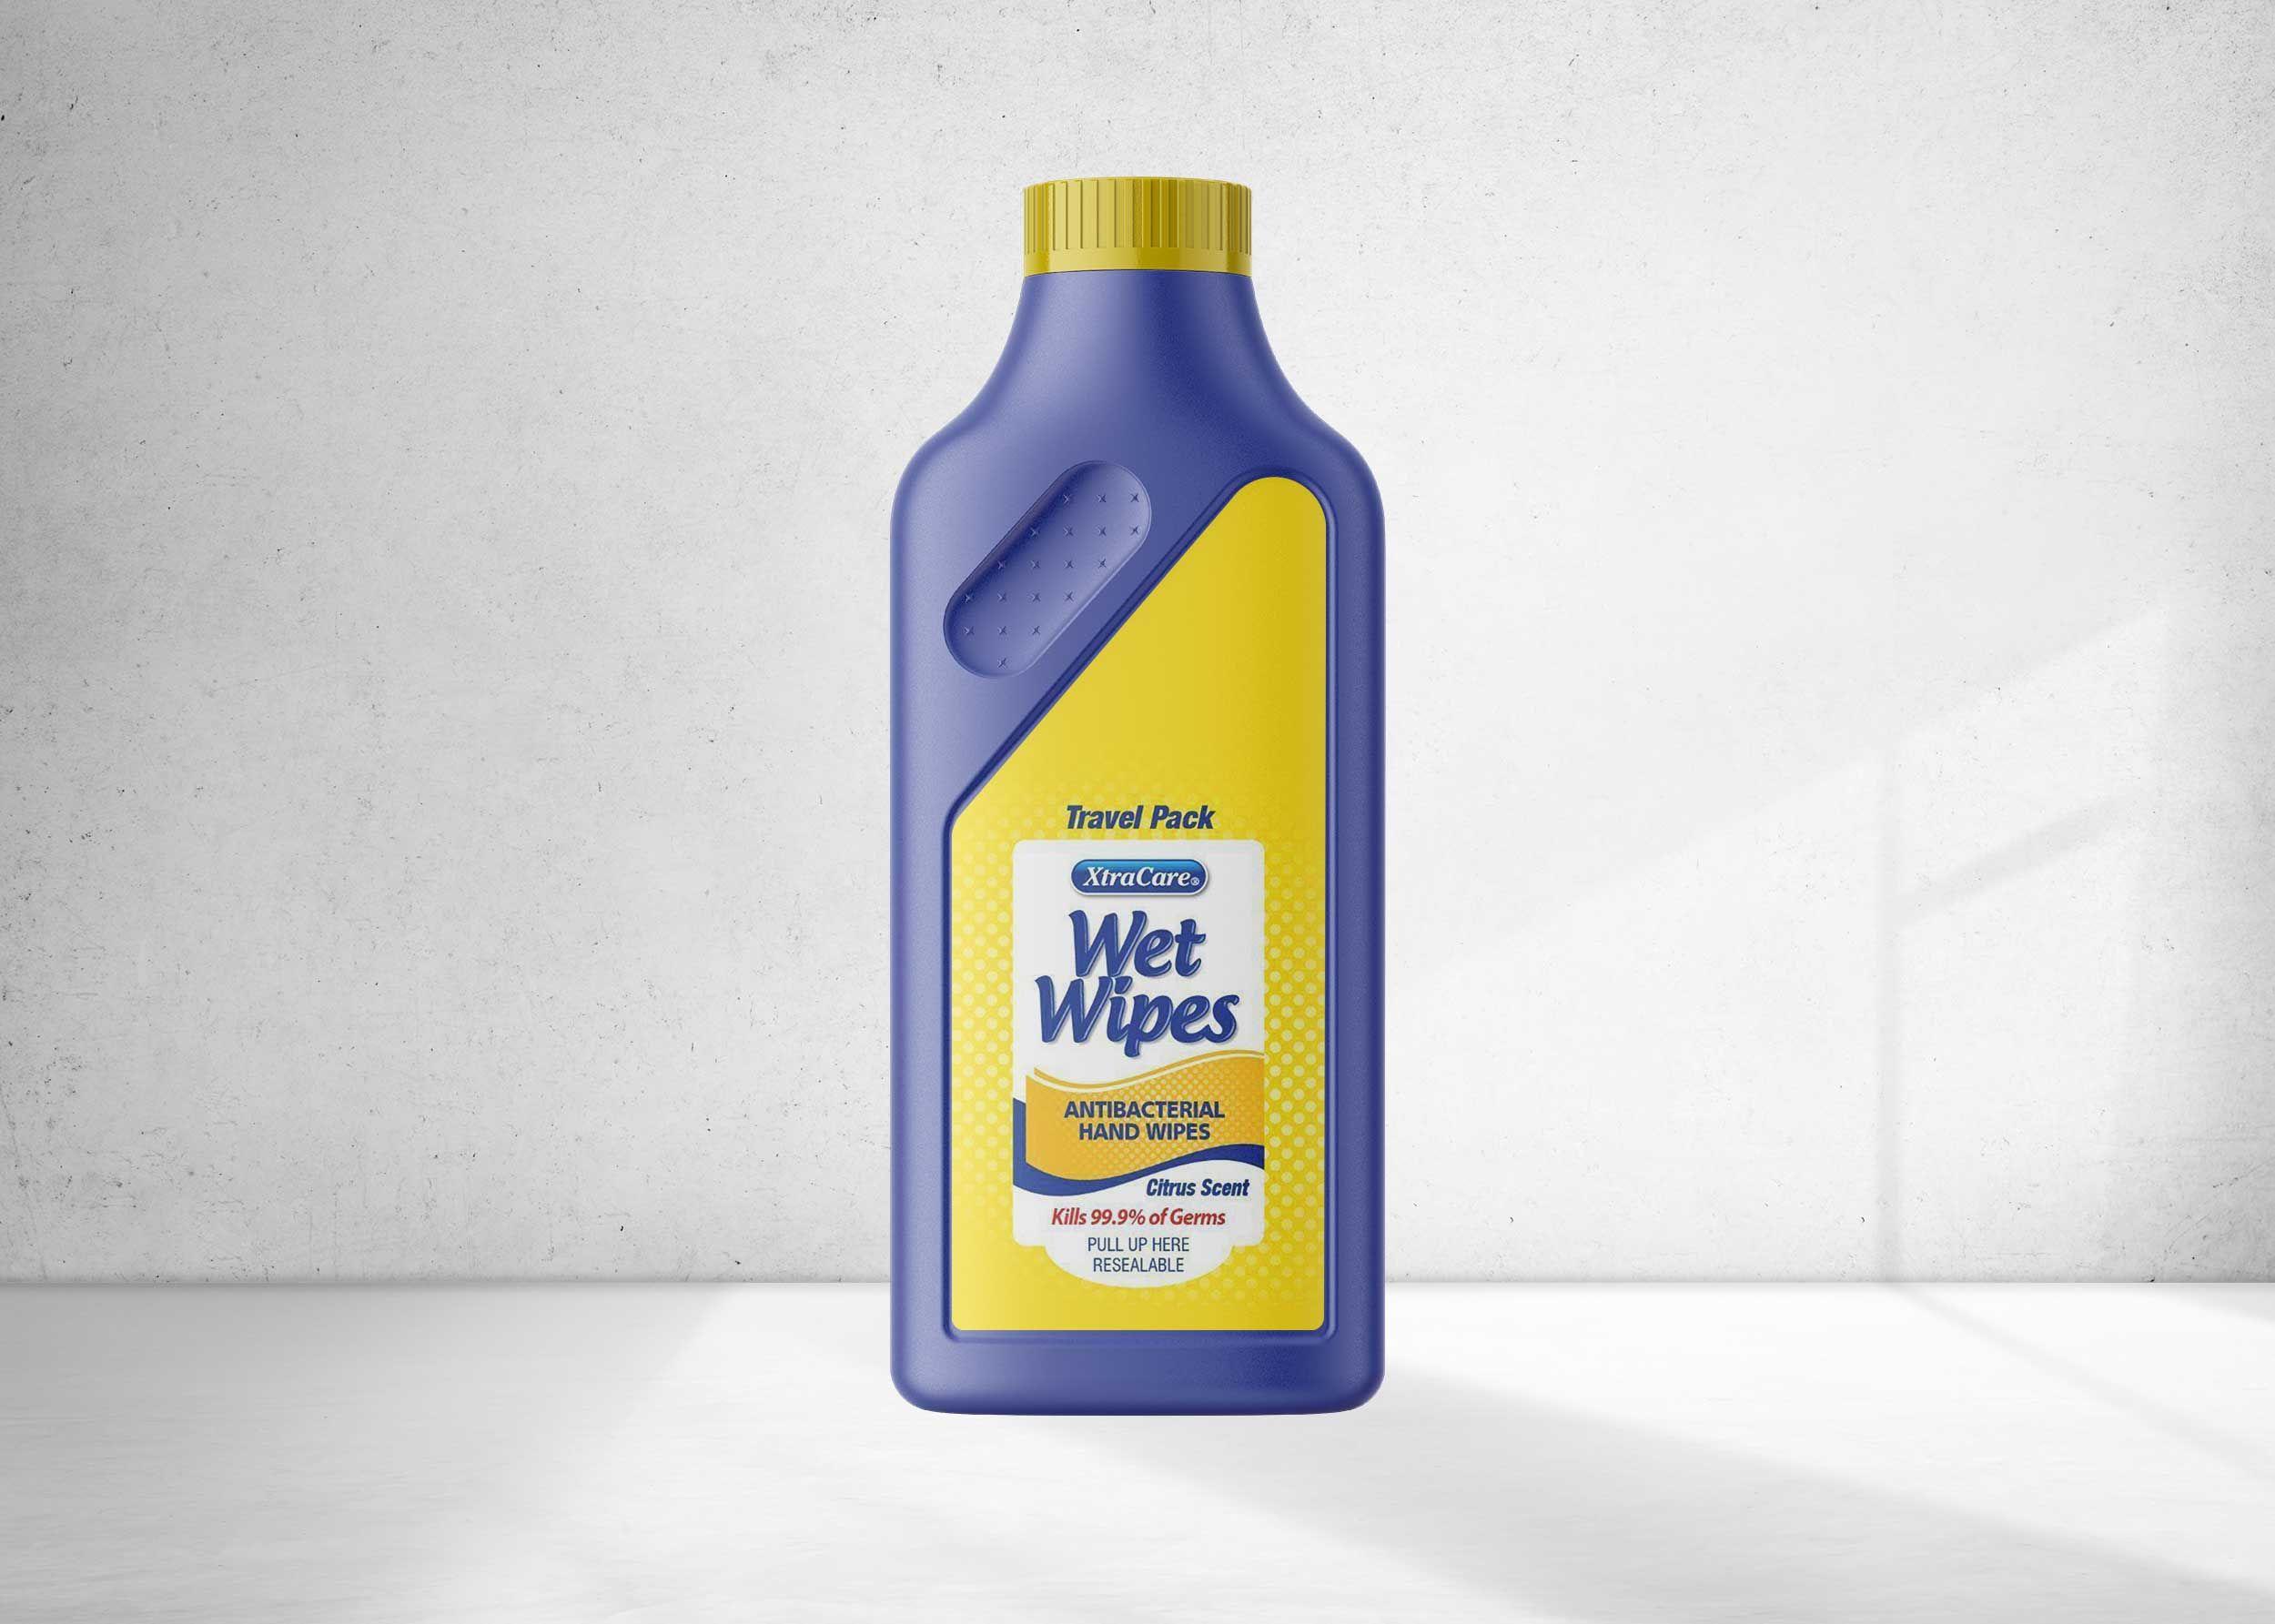 Free Laundry Detergent Bottle Mockup In 2020 Bottle Mockup Logo